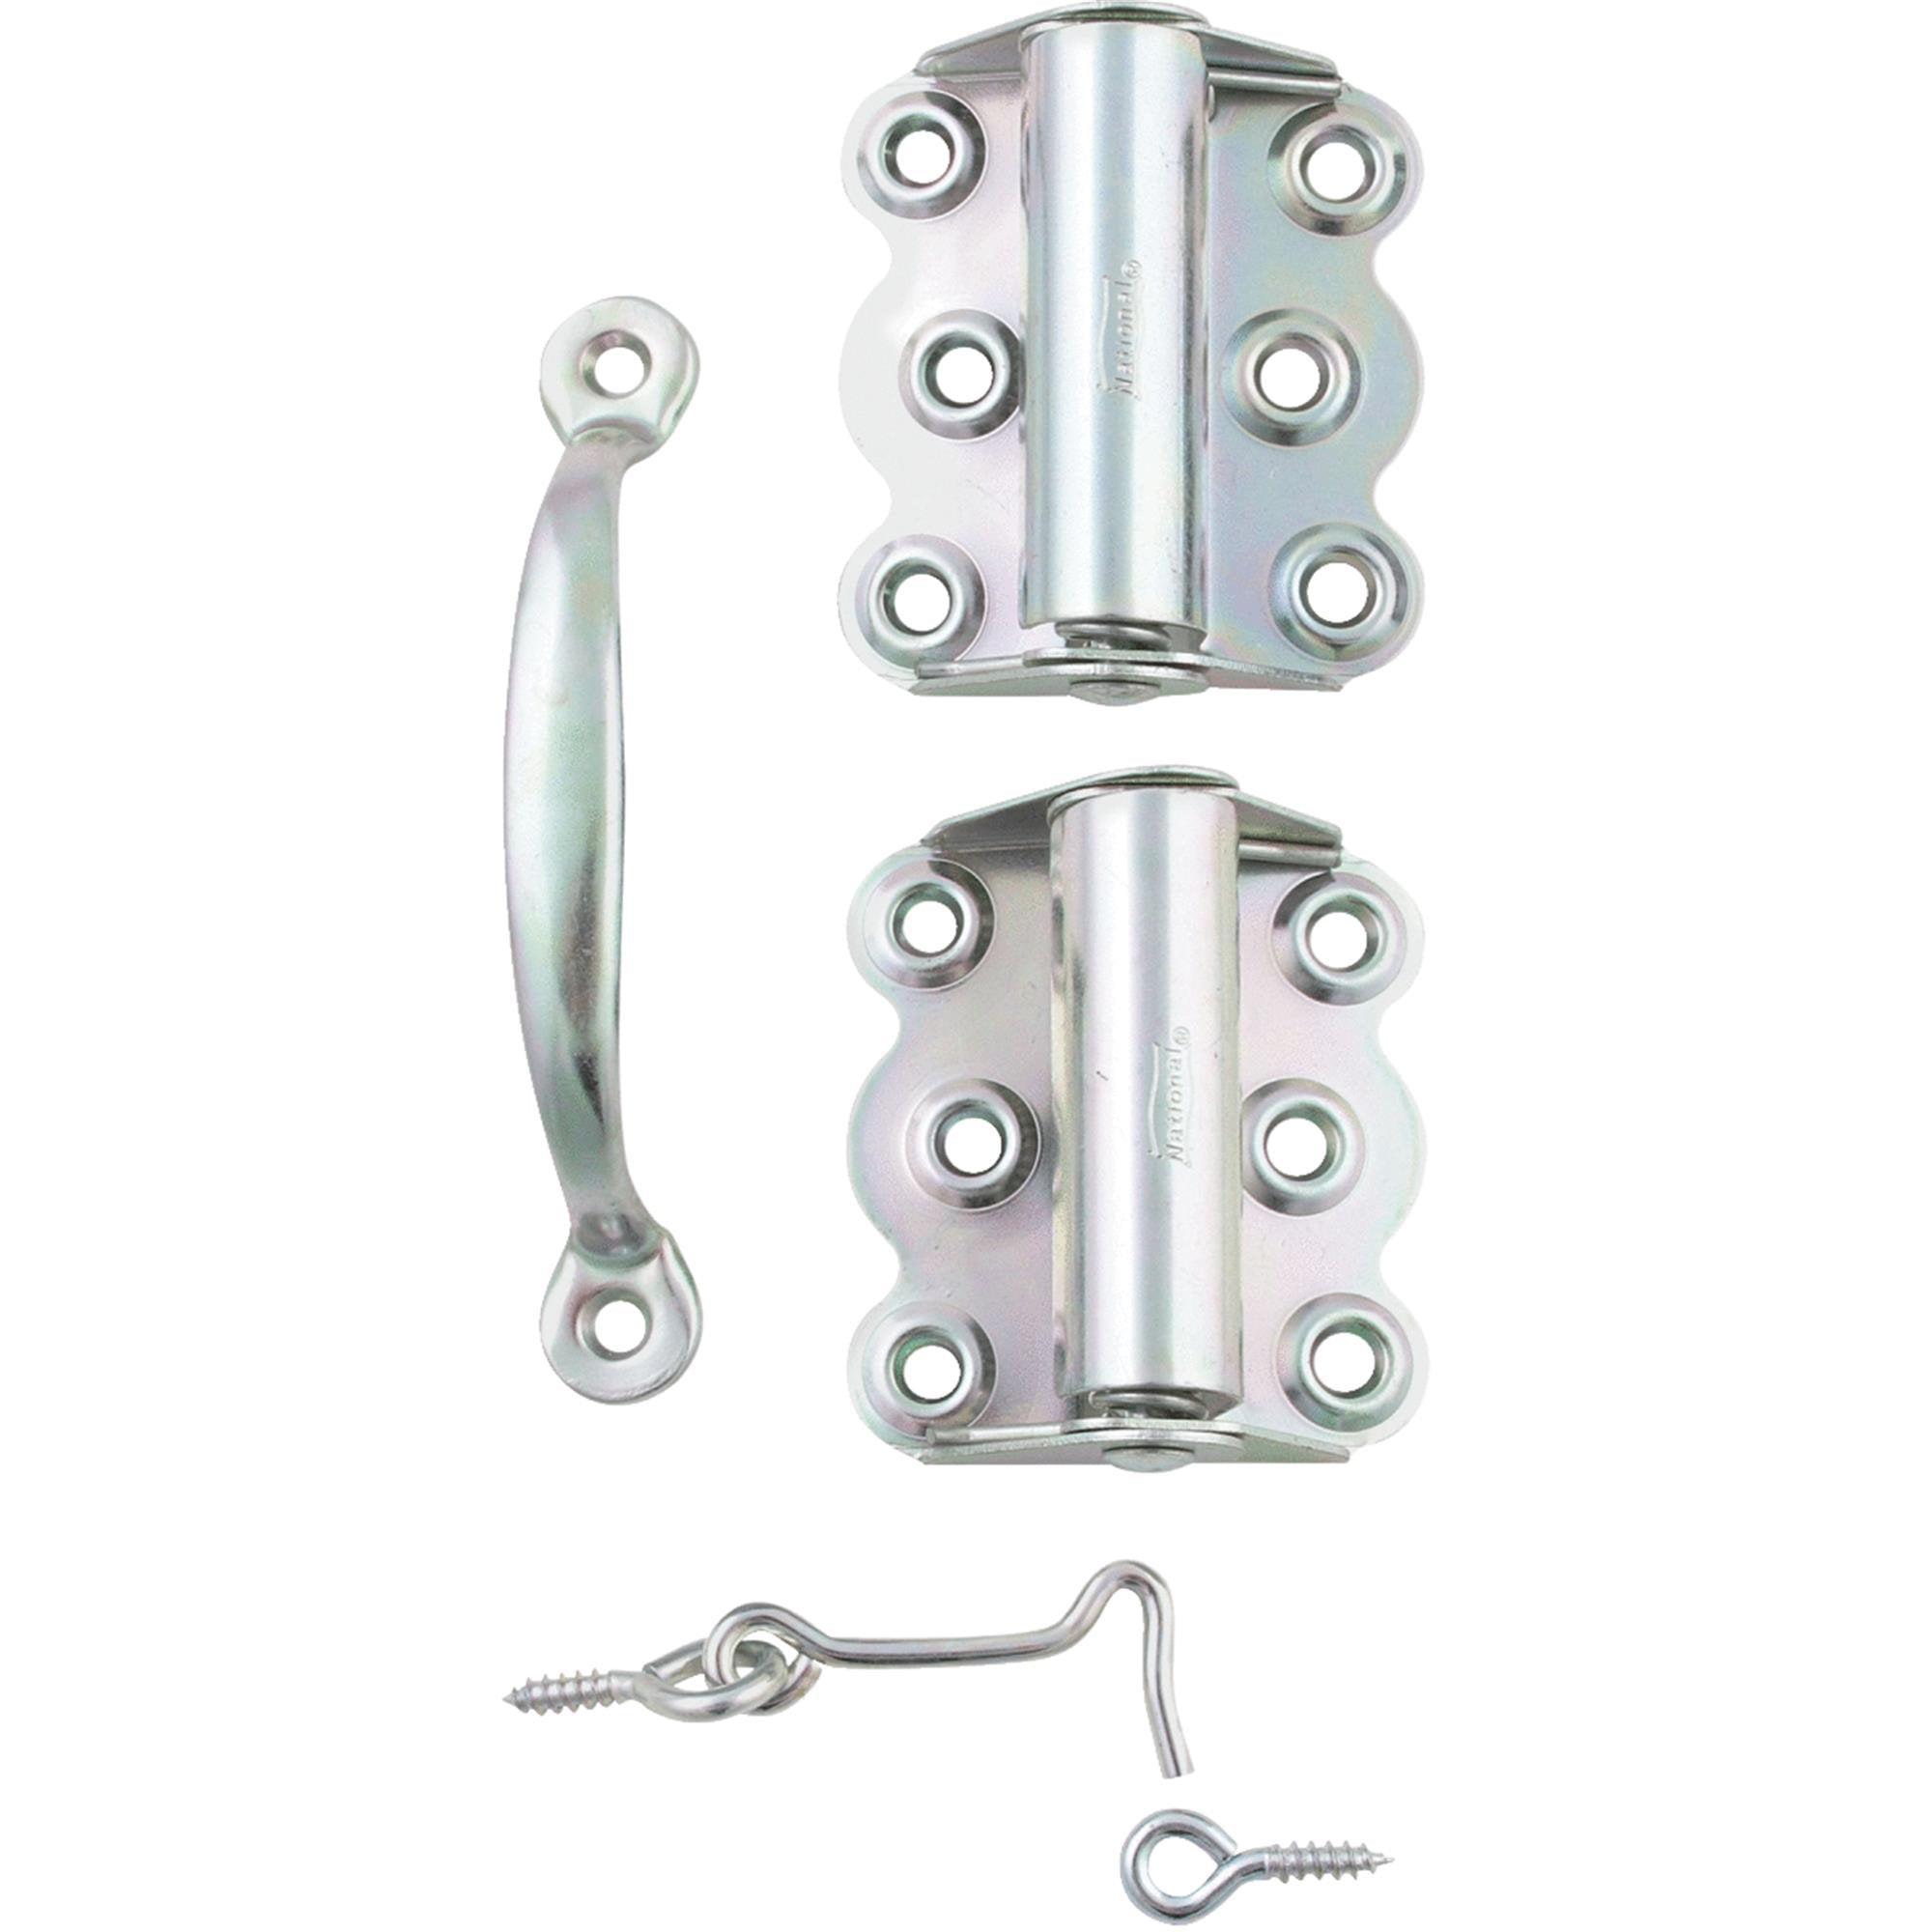 Larson QuickFit Easy Install Bronze Matching Handleset for Envison Storm Doors